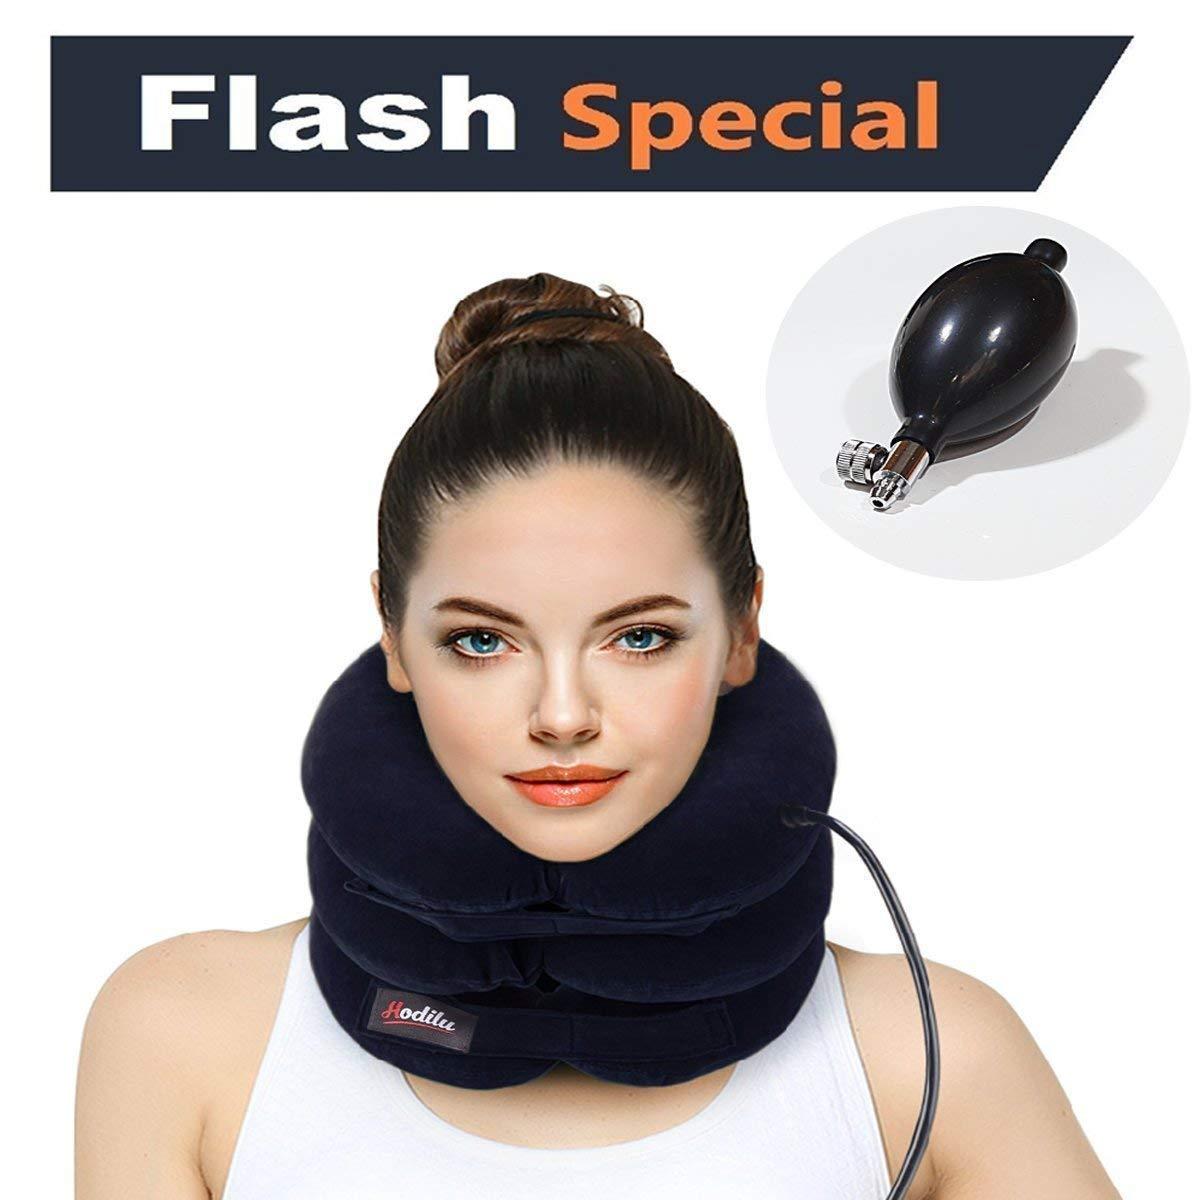 Hodilu Cervical Neck Traction Device - Pain Relieving Remedy Chronic Neck & Shoulder Alignment Pain - Inflatable Neck Stretcher Collar Pillow + Pump Bonus